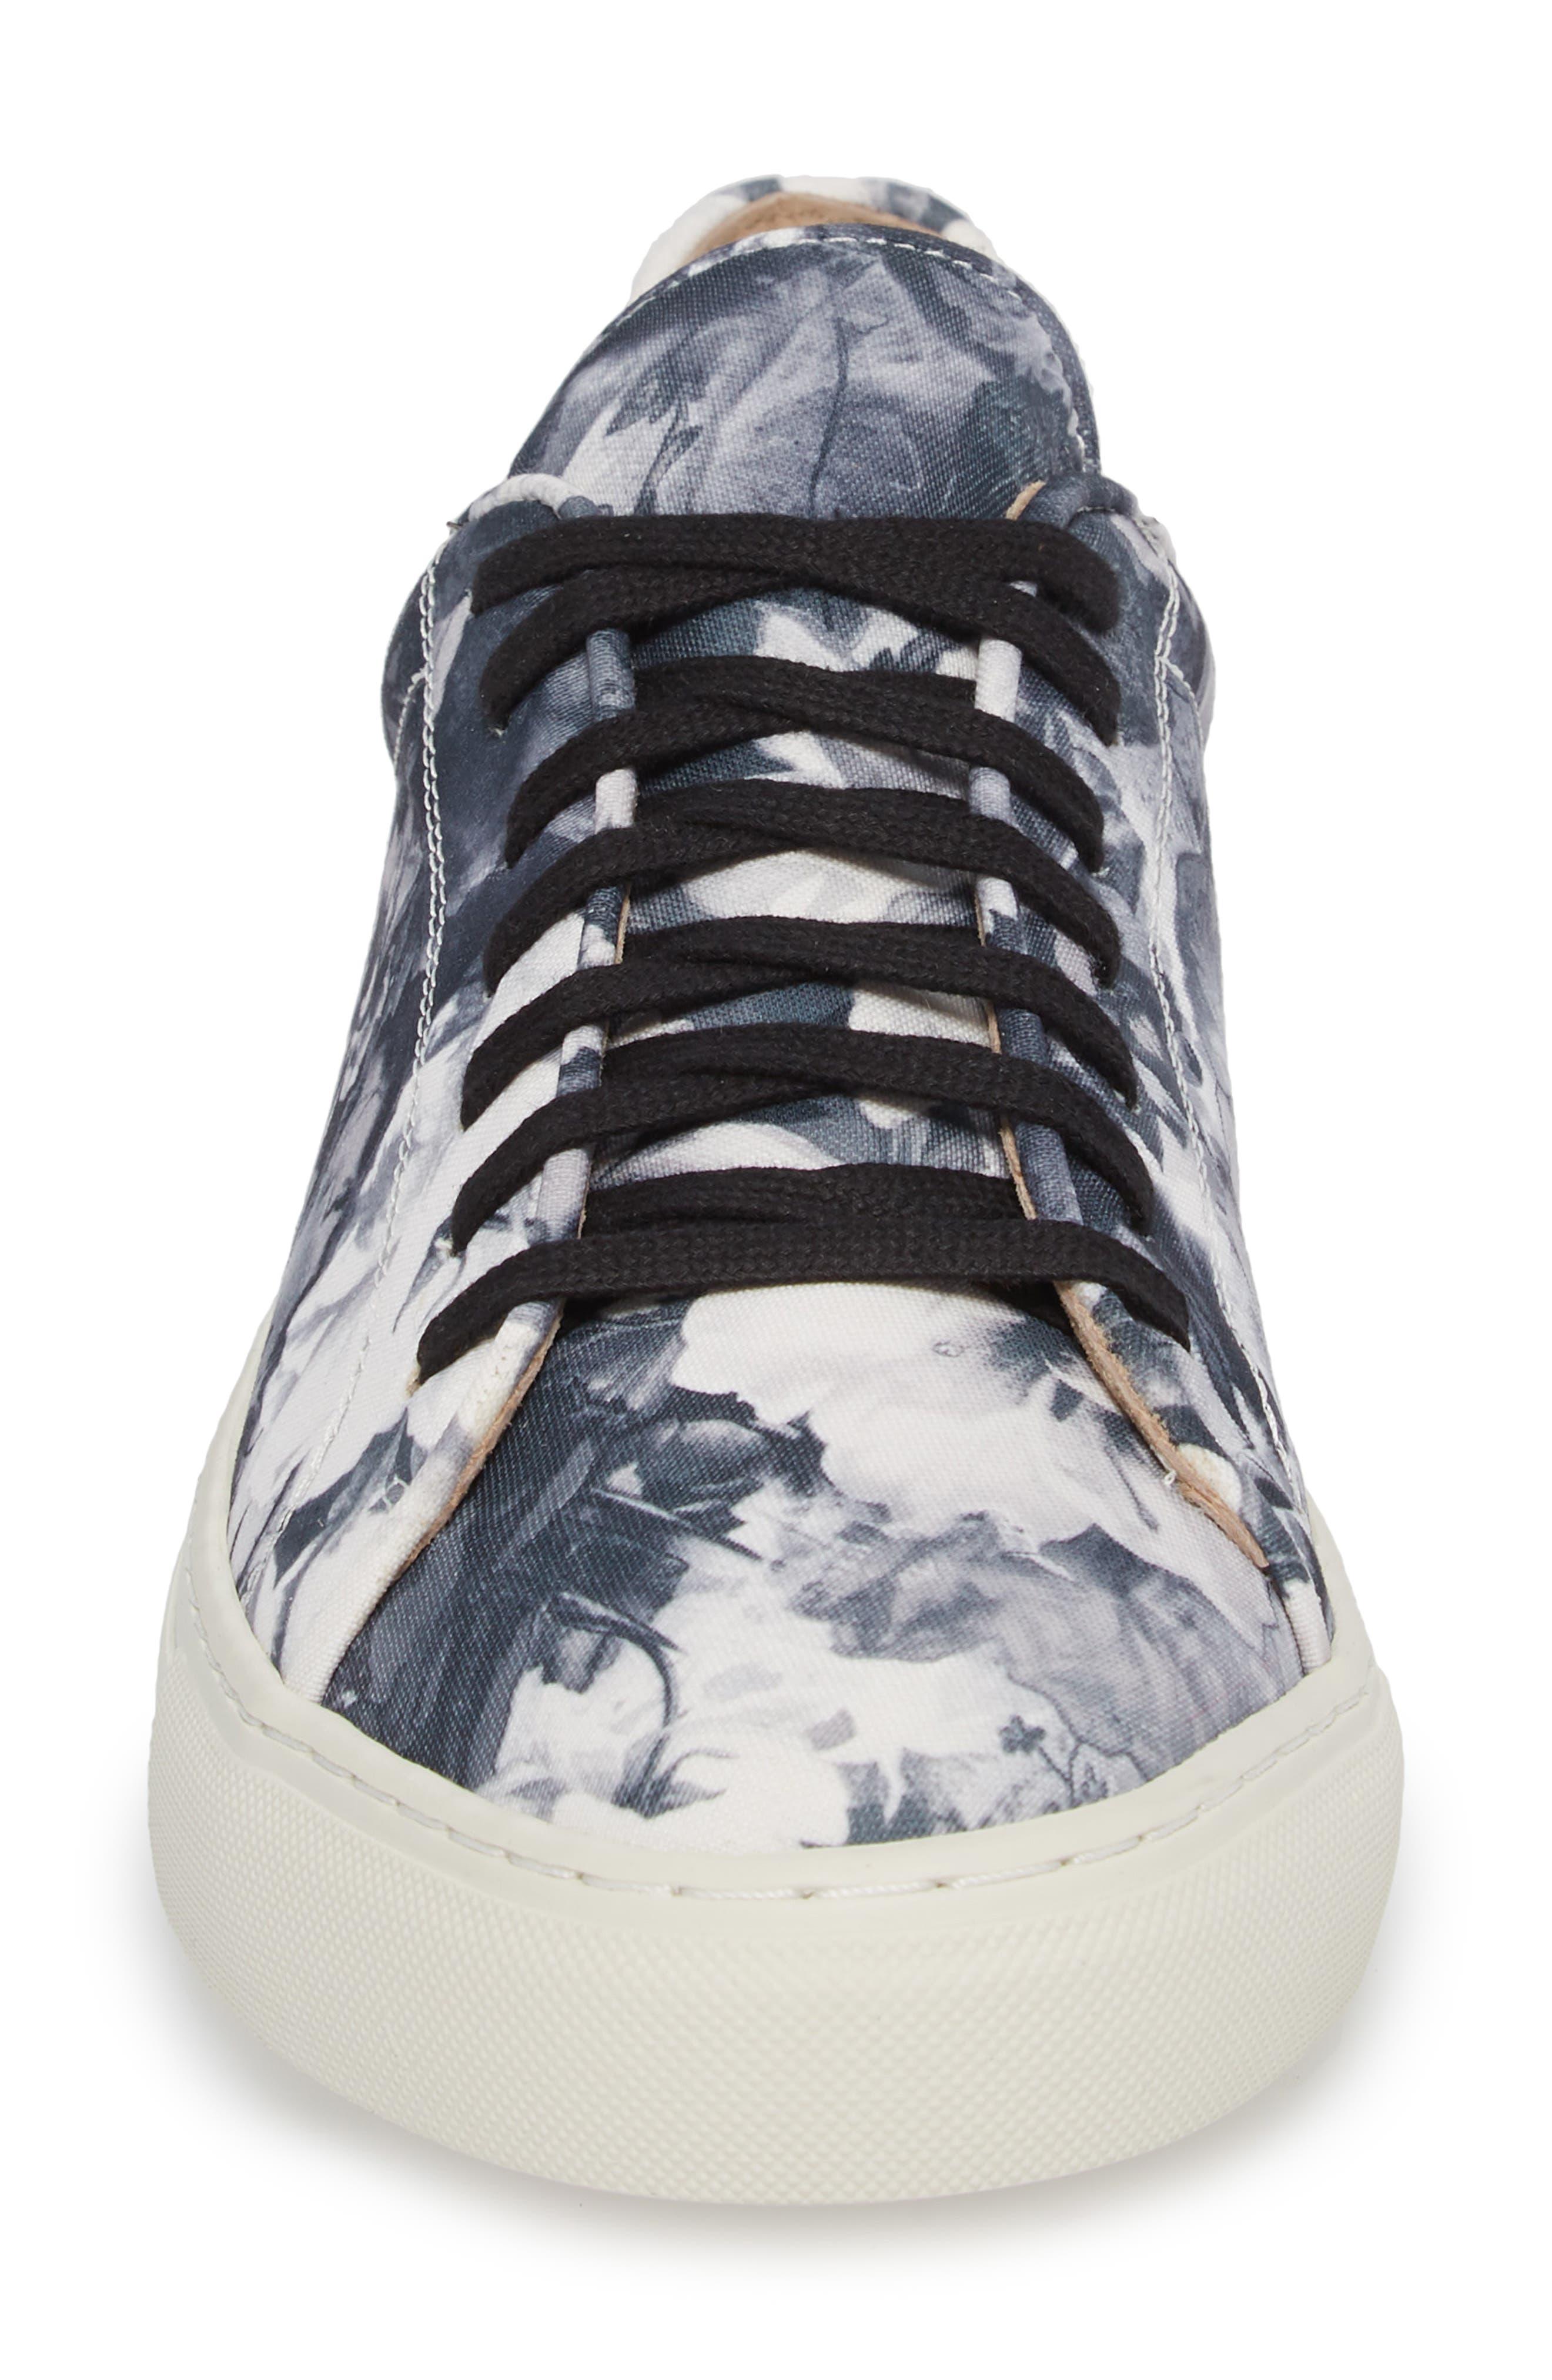 Mason Print Low Top Sneaker,                             Alternate thumbnail 4, color,                             005